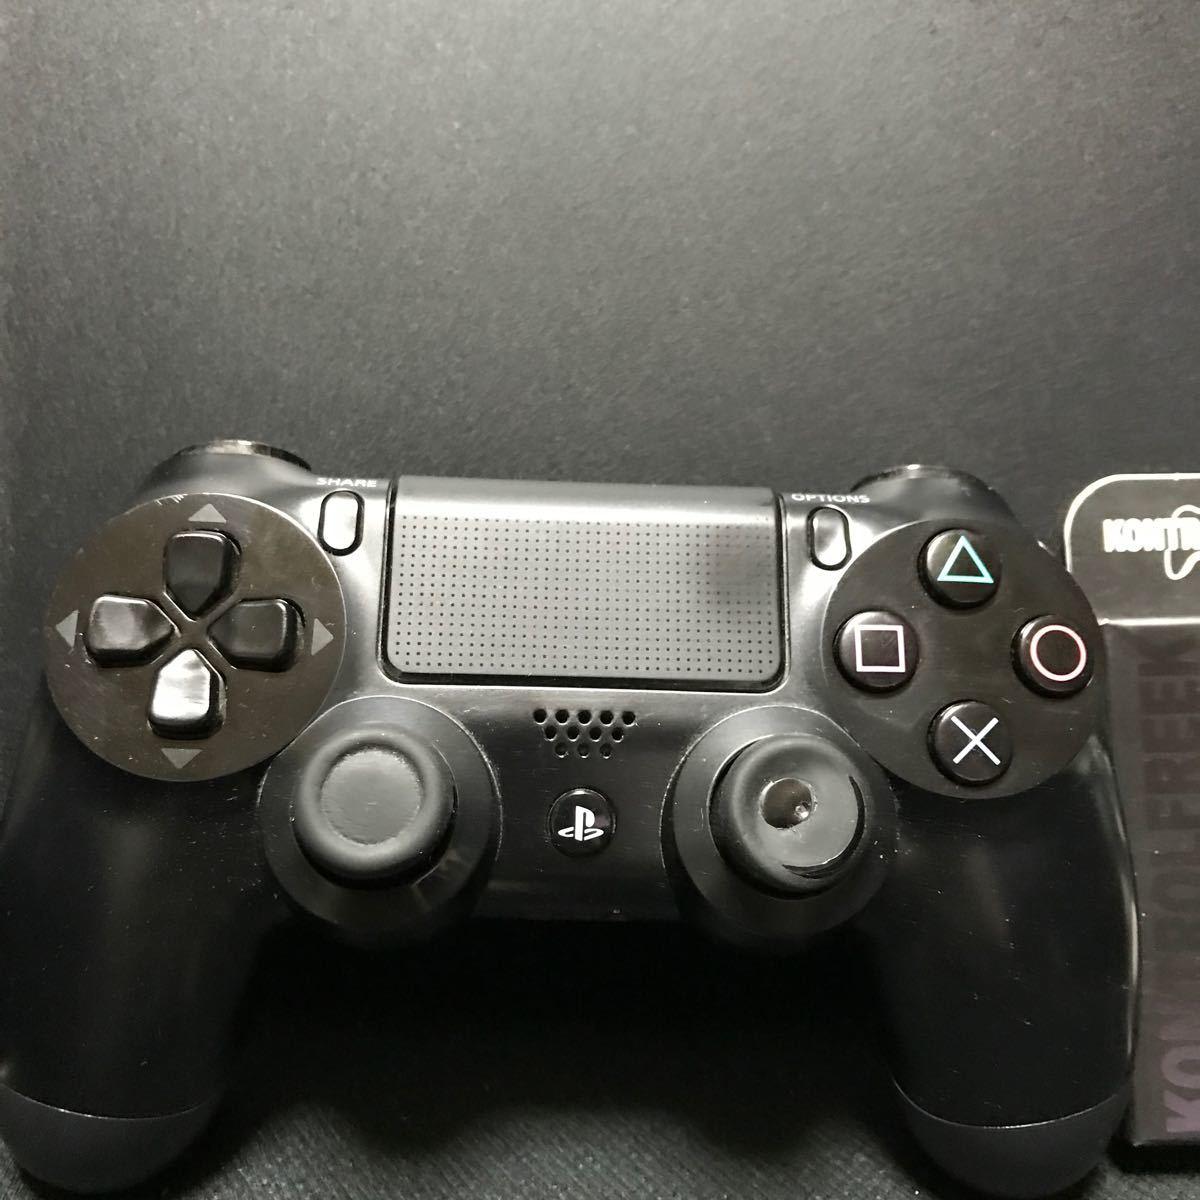 PS4 ジェット・ブラック PlayStation4 PS4本体